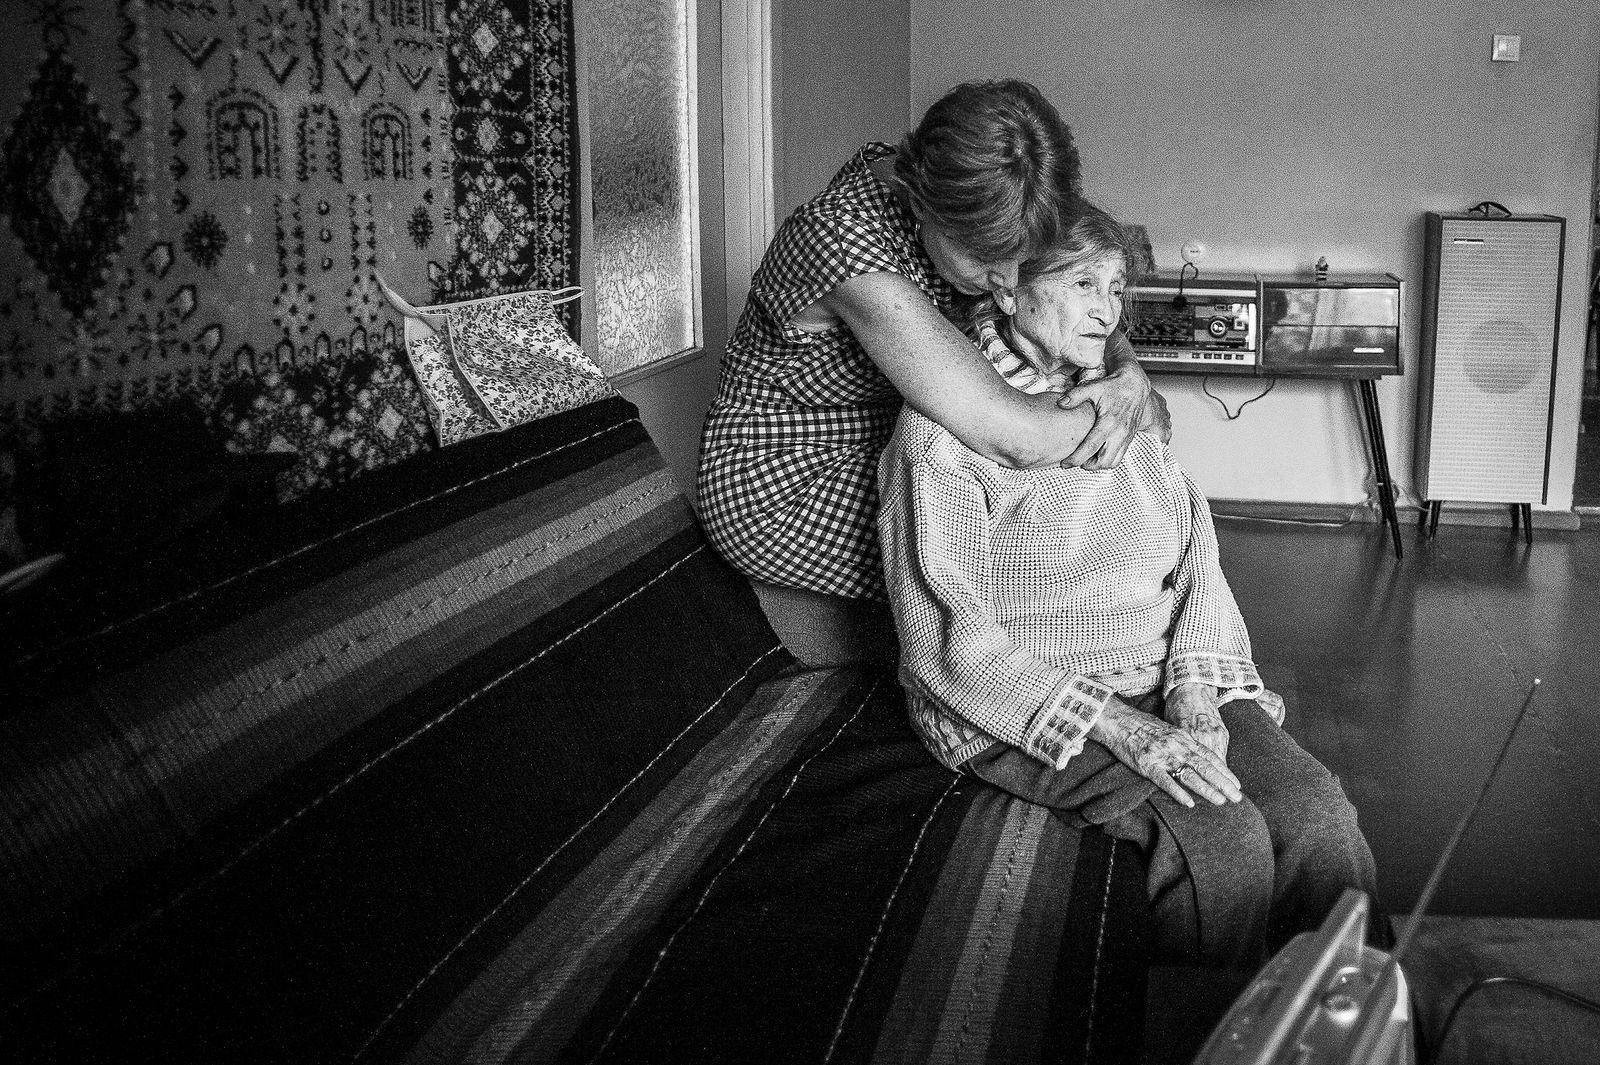 Arik Shraga. Latvia. Riga. Nelli and her homecare worker